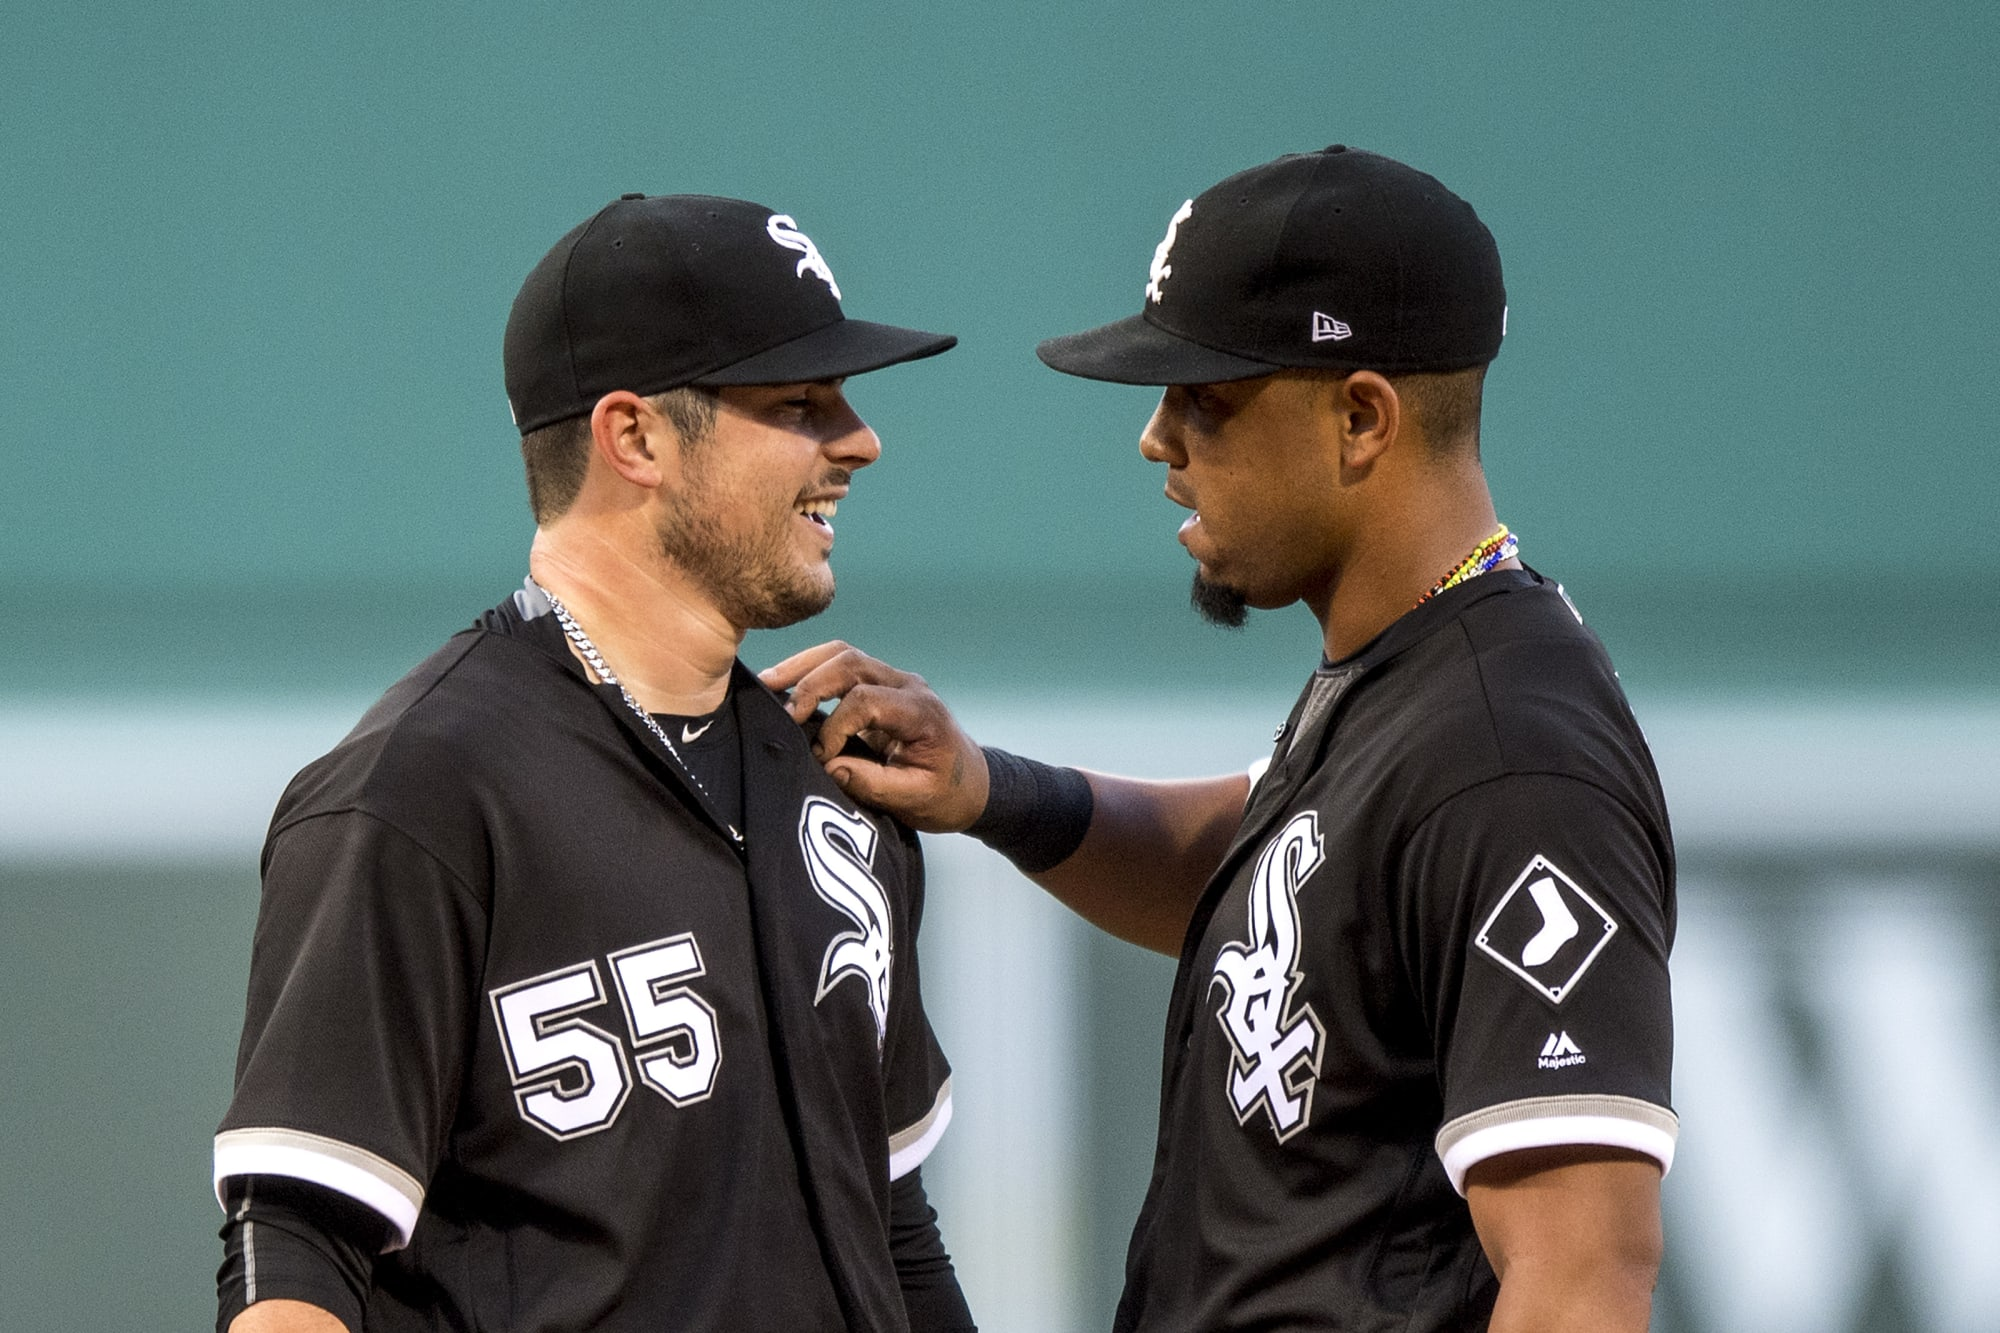 White Sox Video: Jose Abreu saves Carlos Rodon's no-hitter